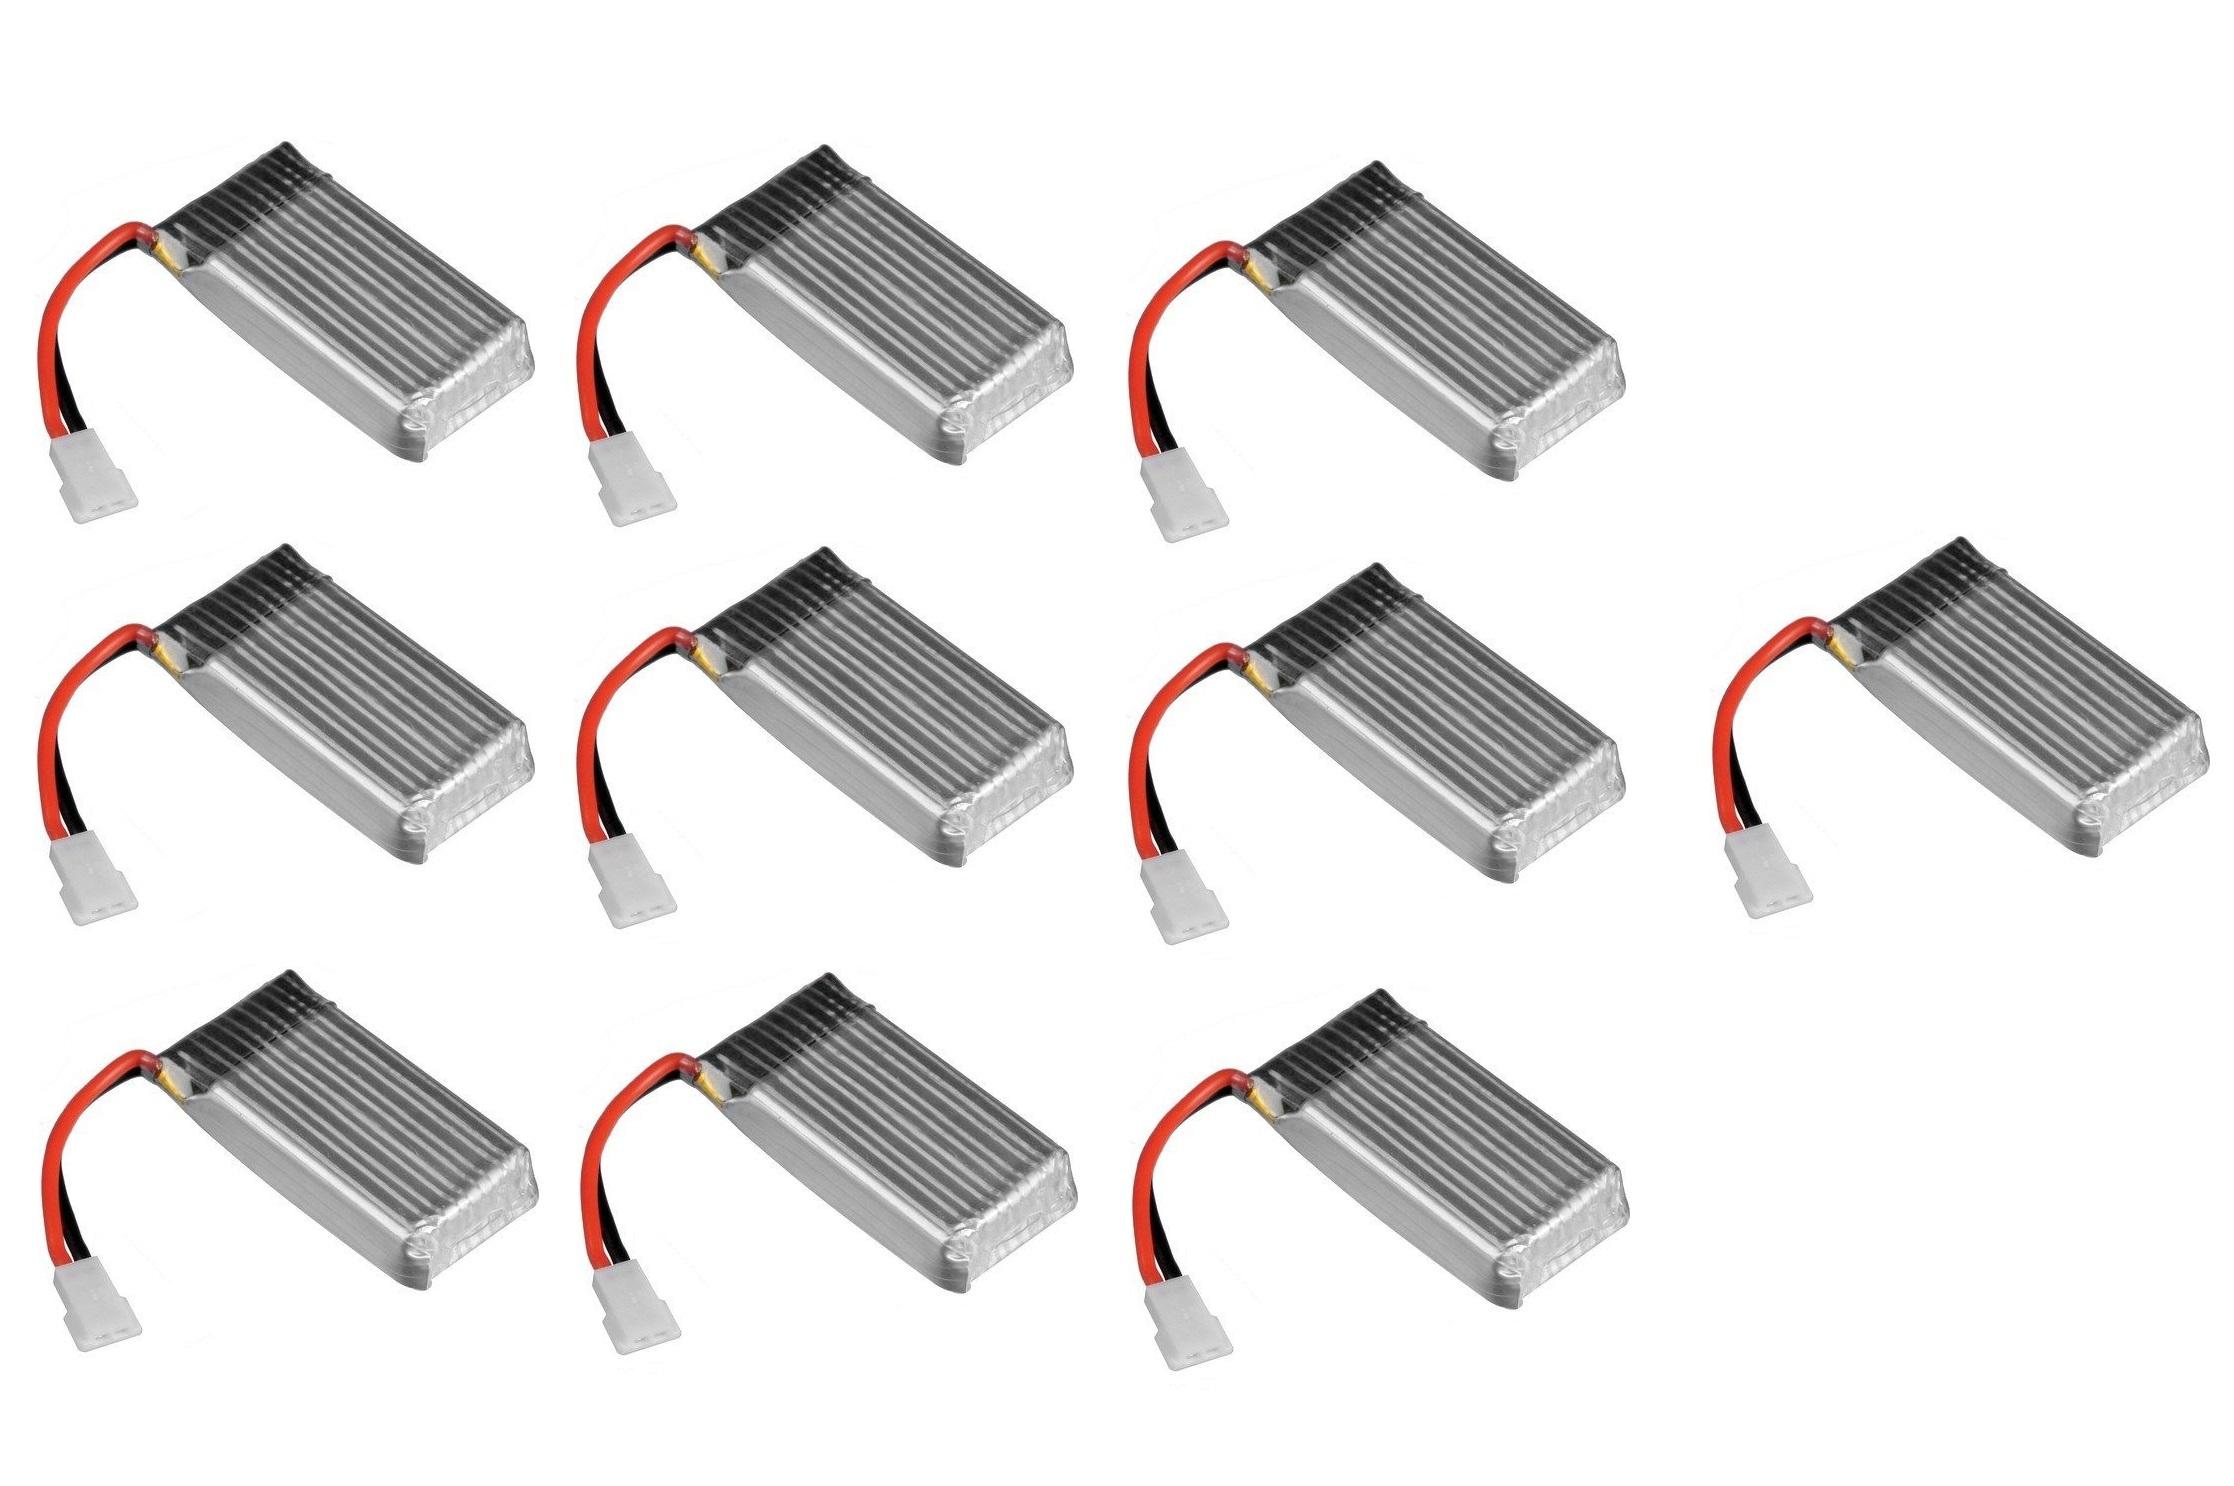 10 X Quantity Of X Drone Nano H107r Battery 3 7v 380mah